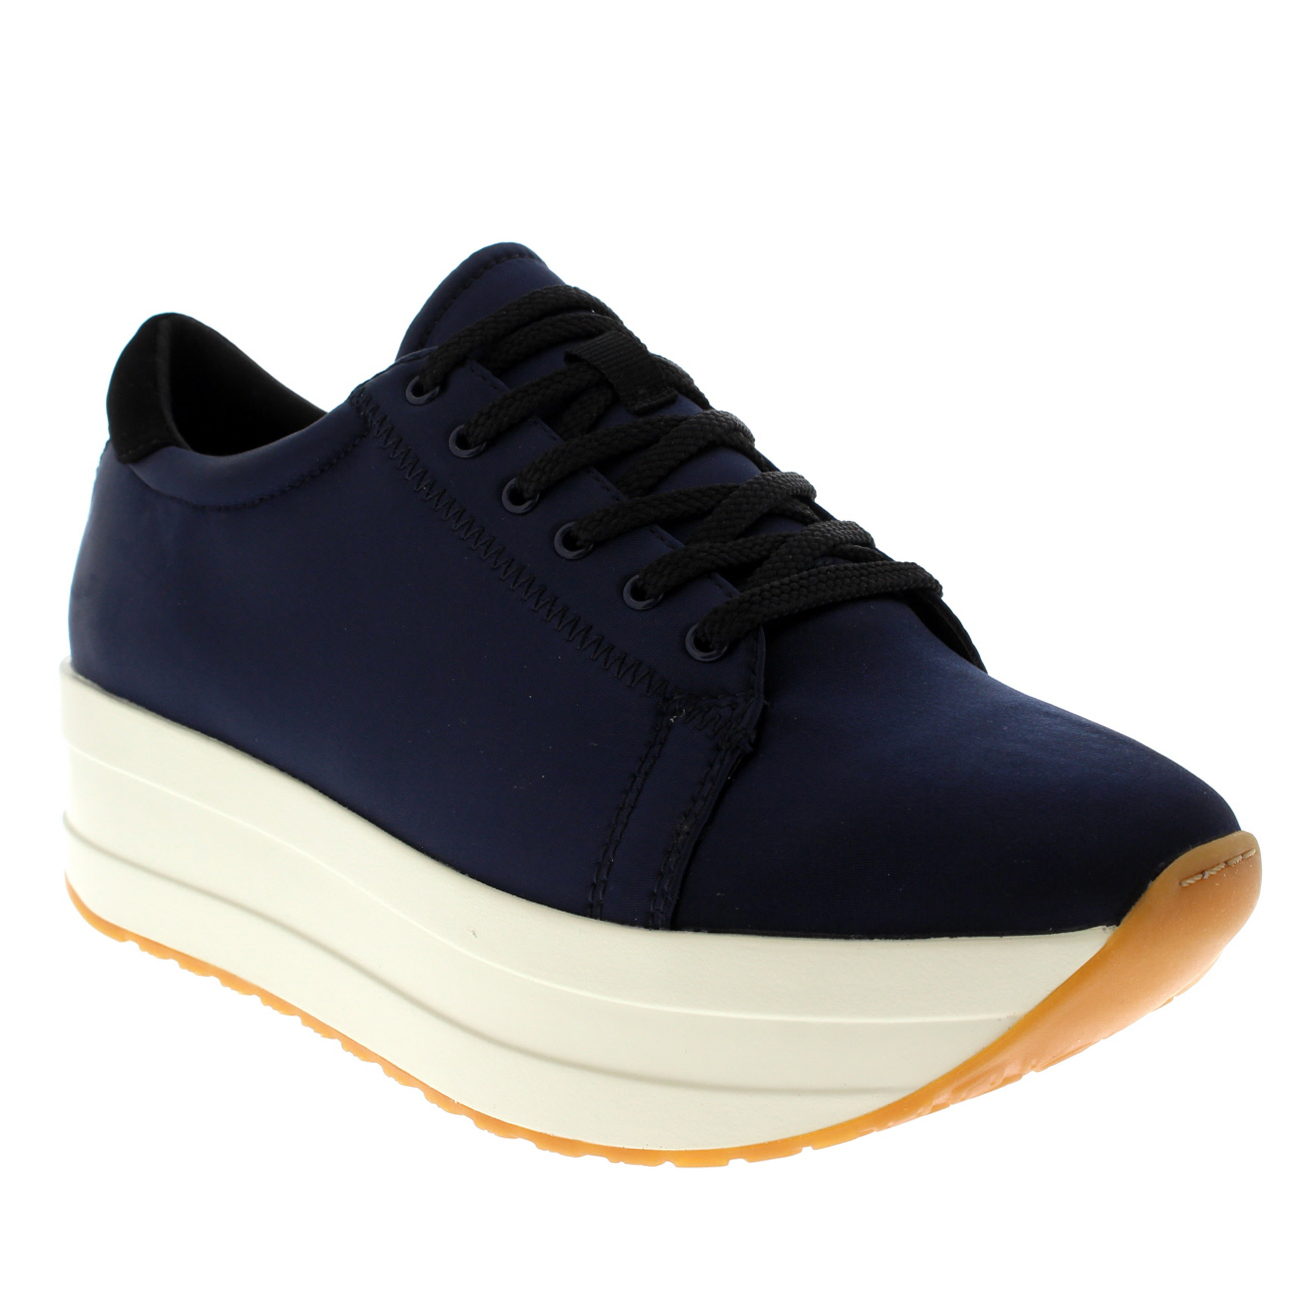 9163562fa7 Details about Womens Vagabond Casey Black Shiny Satin Fashion Platform  Wedge Trainers UK 3-9